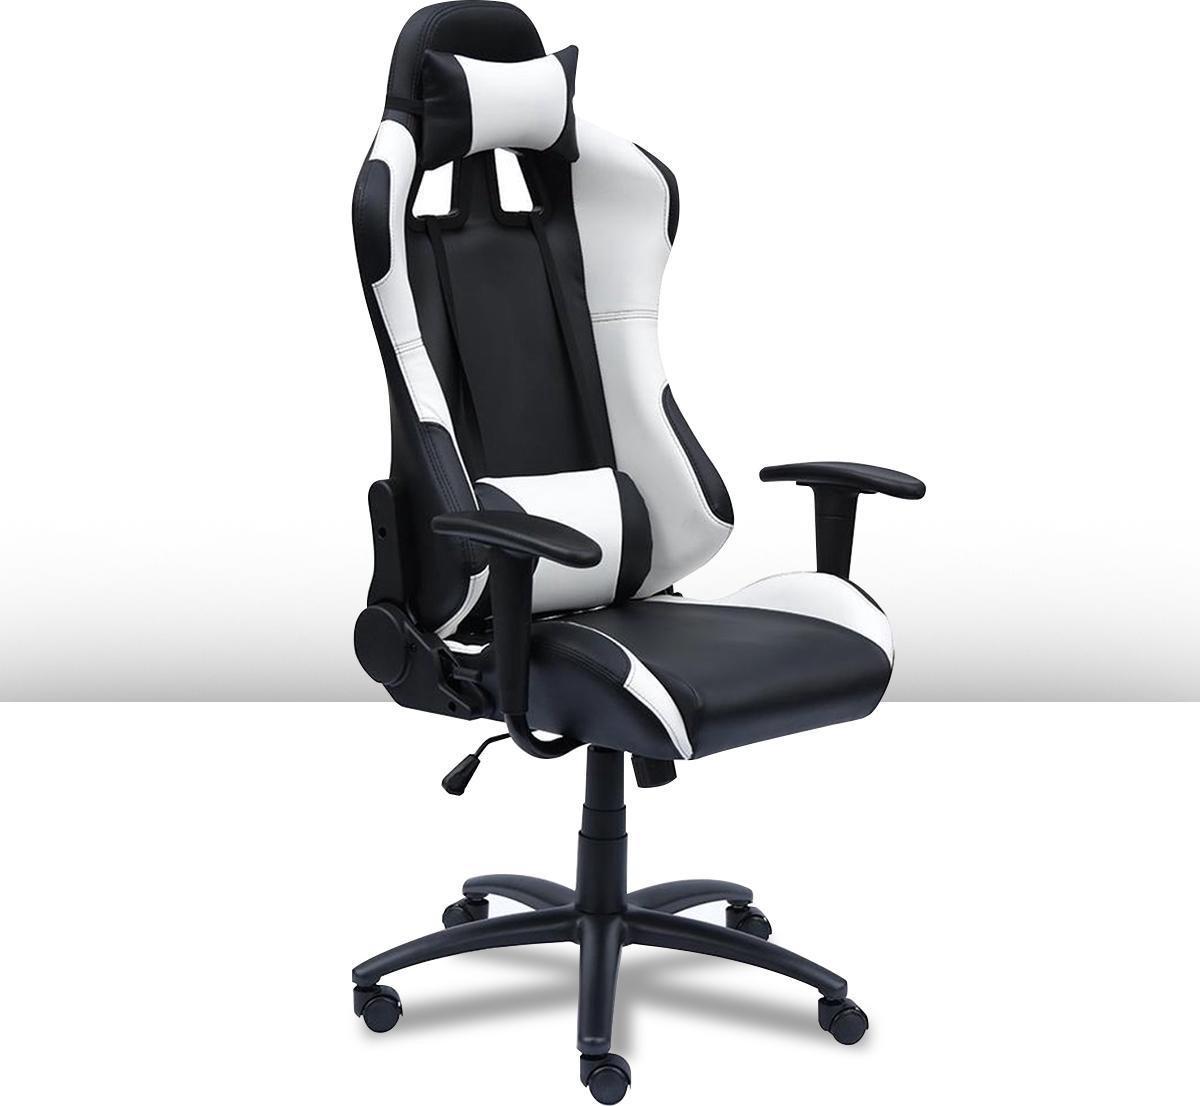 Ocazi Gamestoel - Gaming Stoel - Gaming Chair  - Bureaustoel - Instelbare Zithoogte - Wit - New York